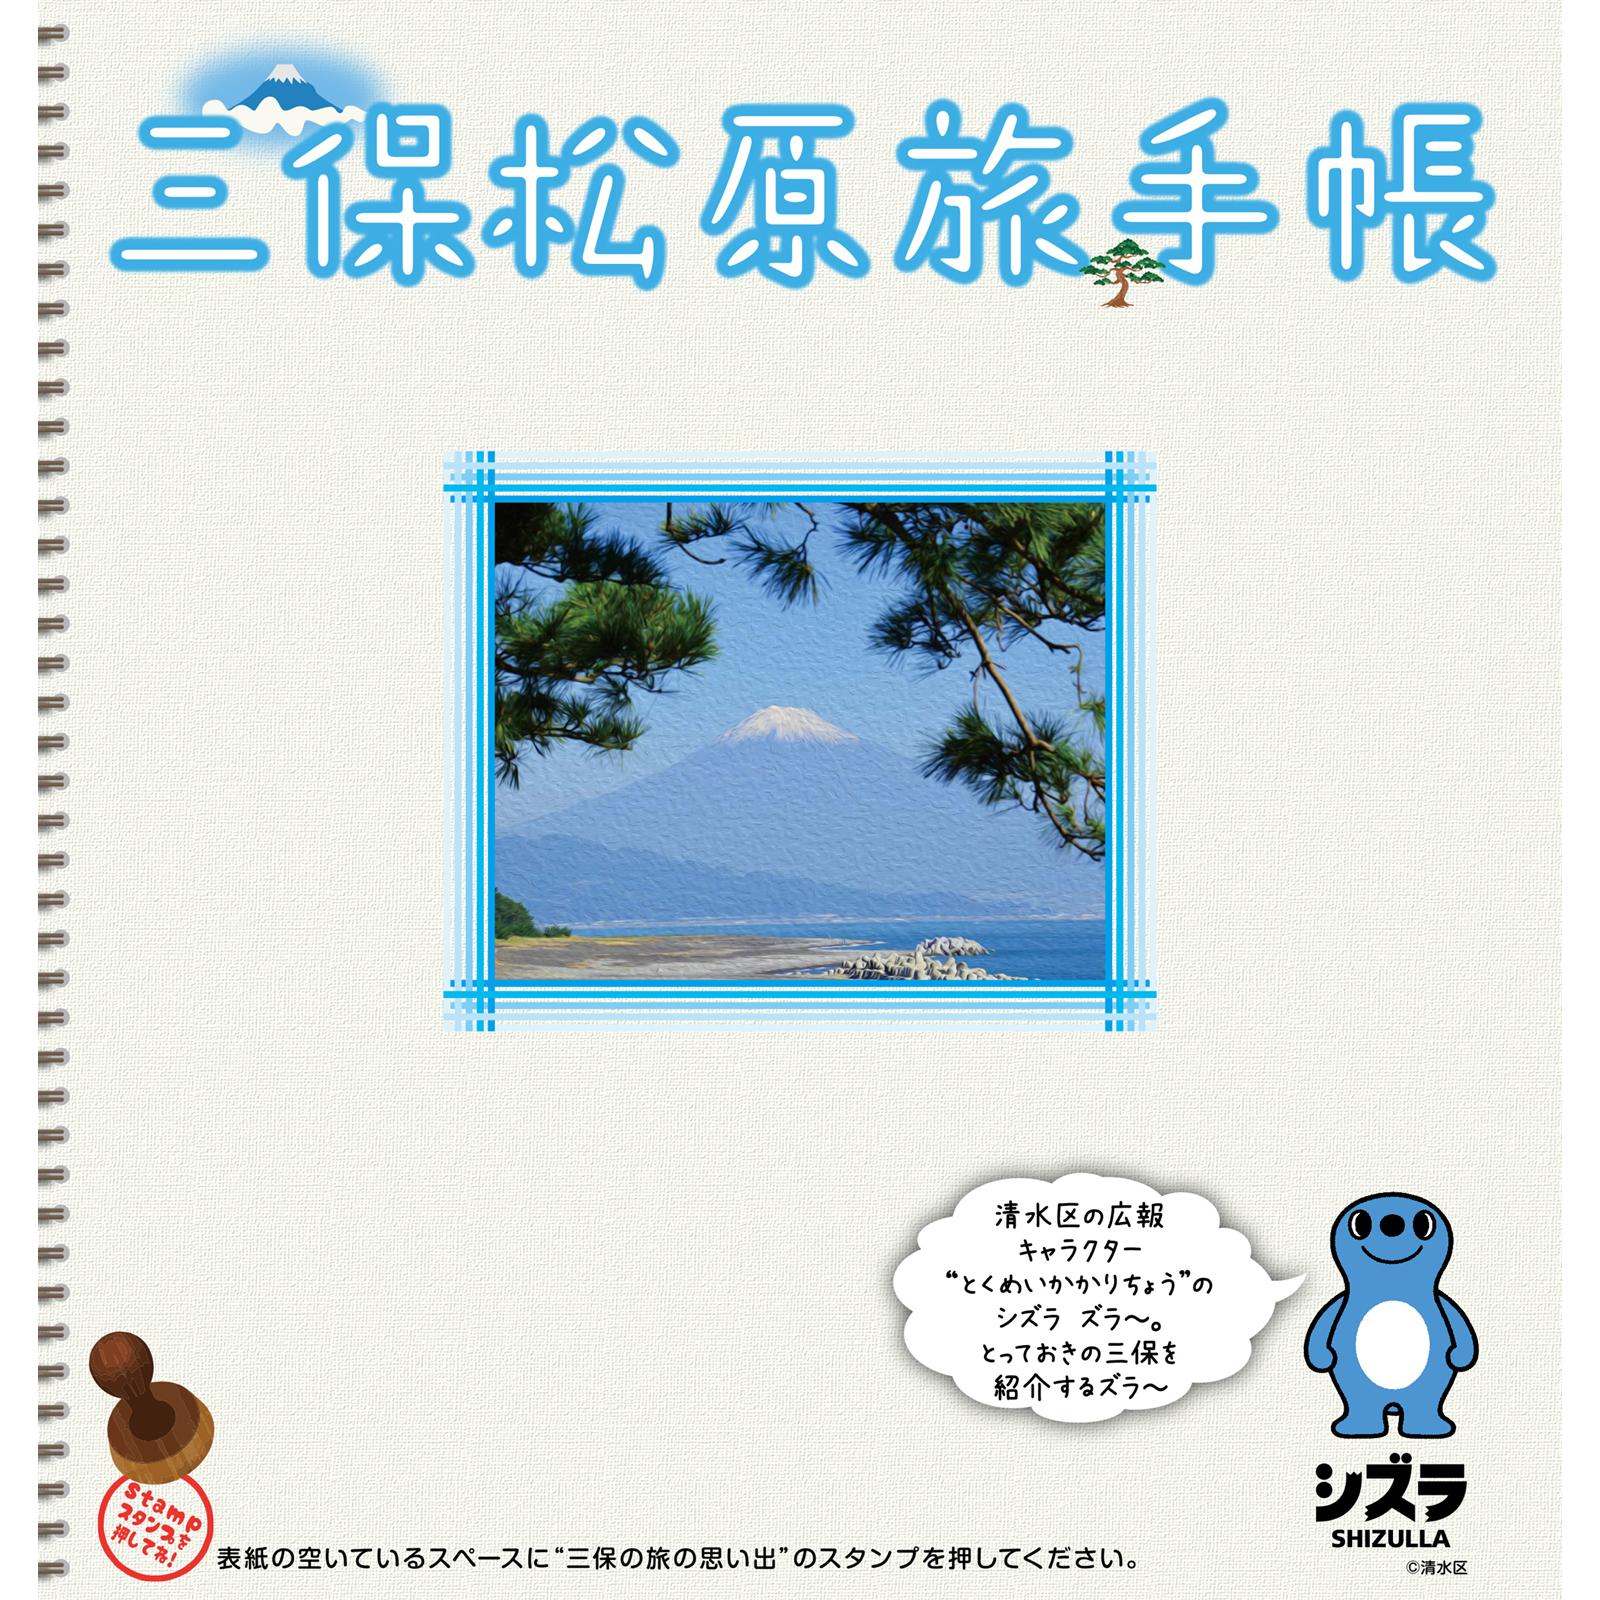 https://www.shizuoka-cb.com/wp-content/uploads/2021/03/bannerQ-1600x1600-2.png